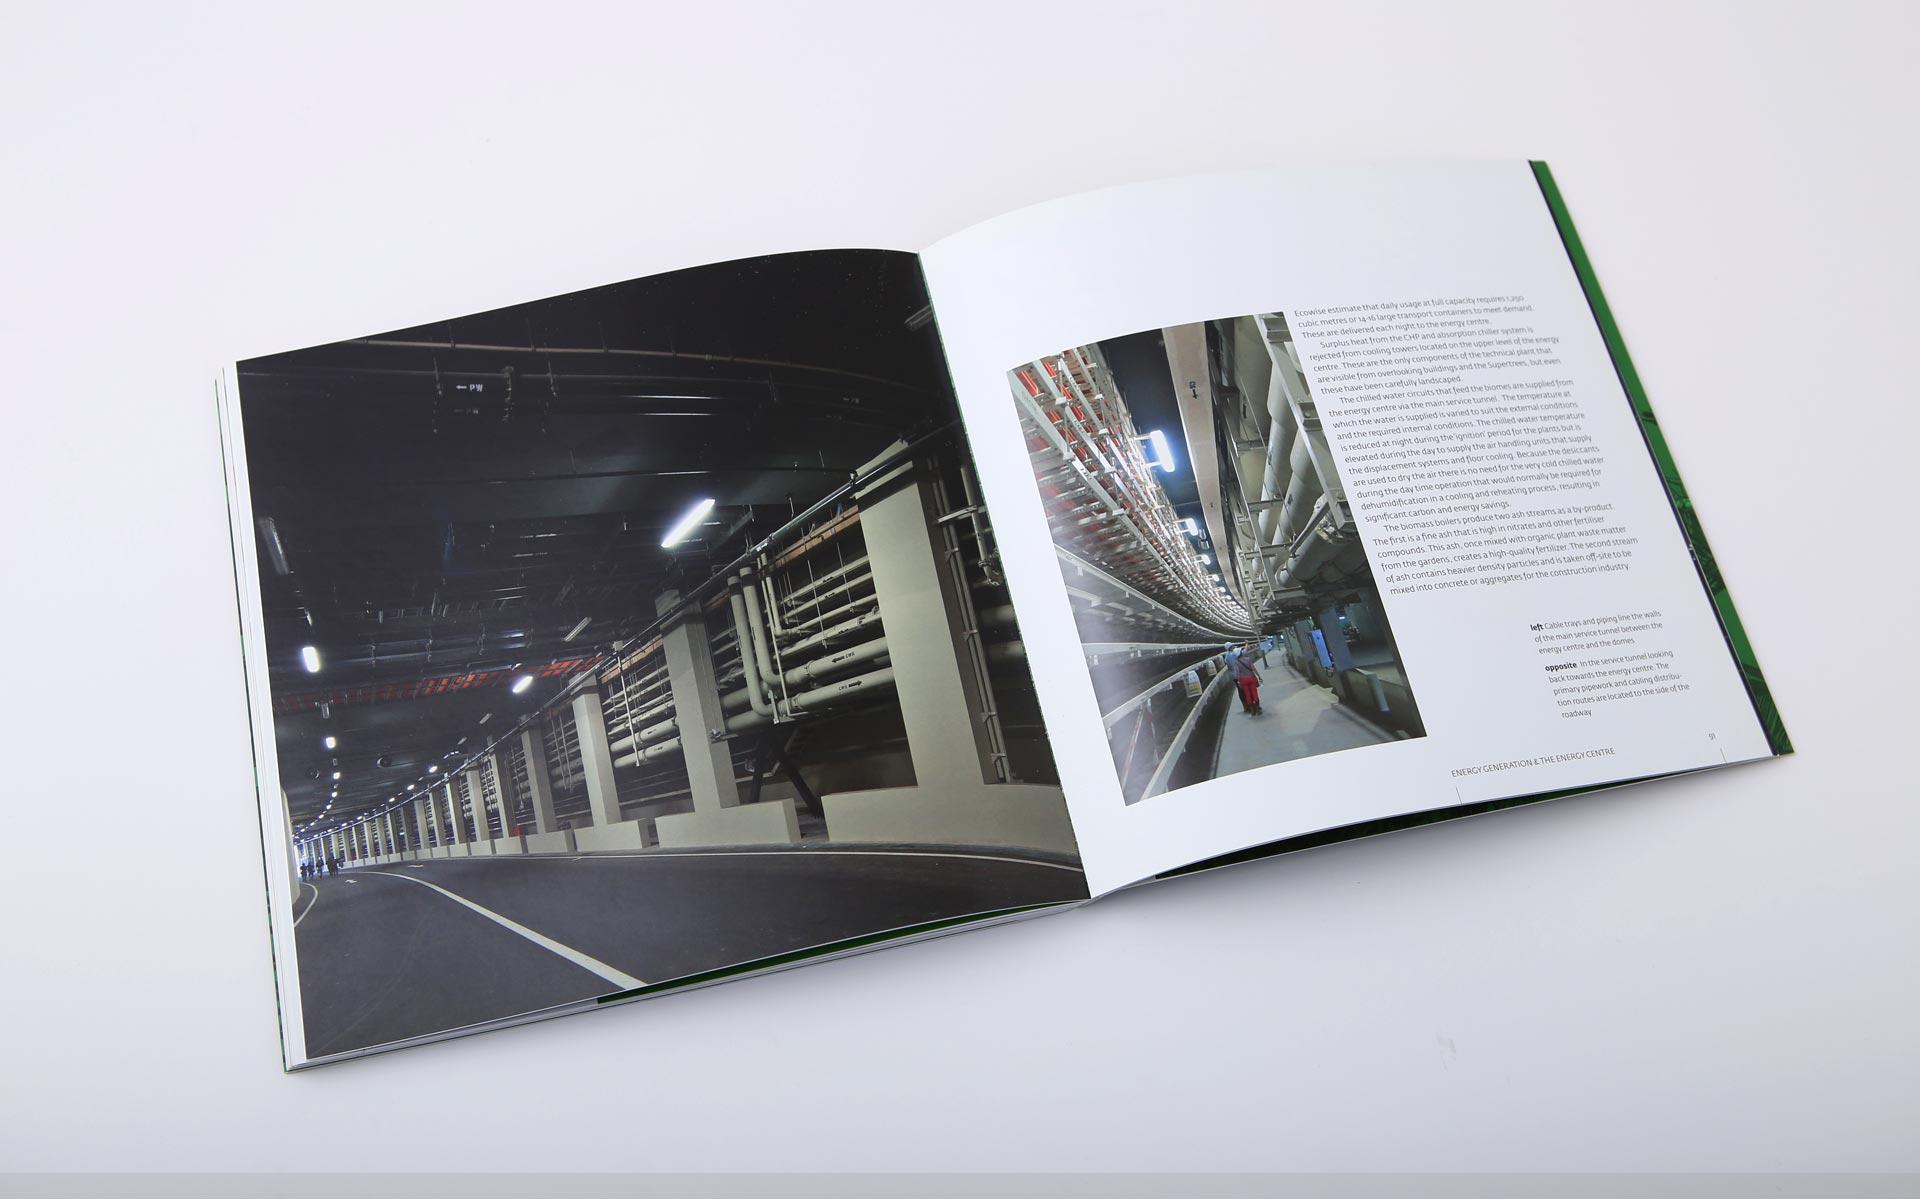 atelier-ten-book-design-3